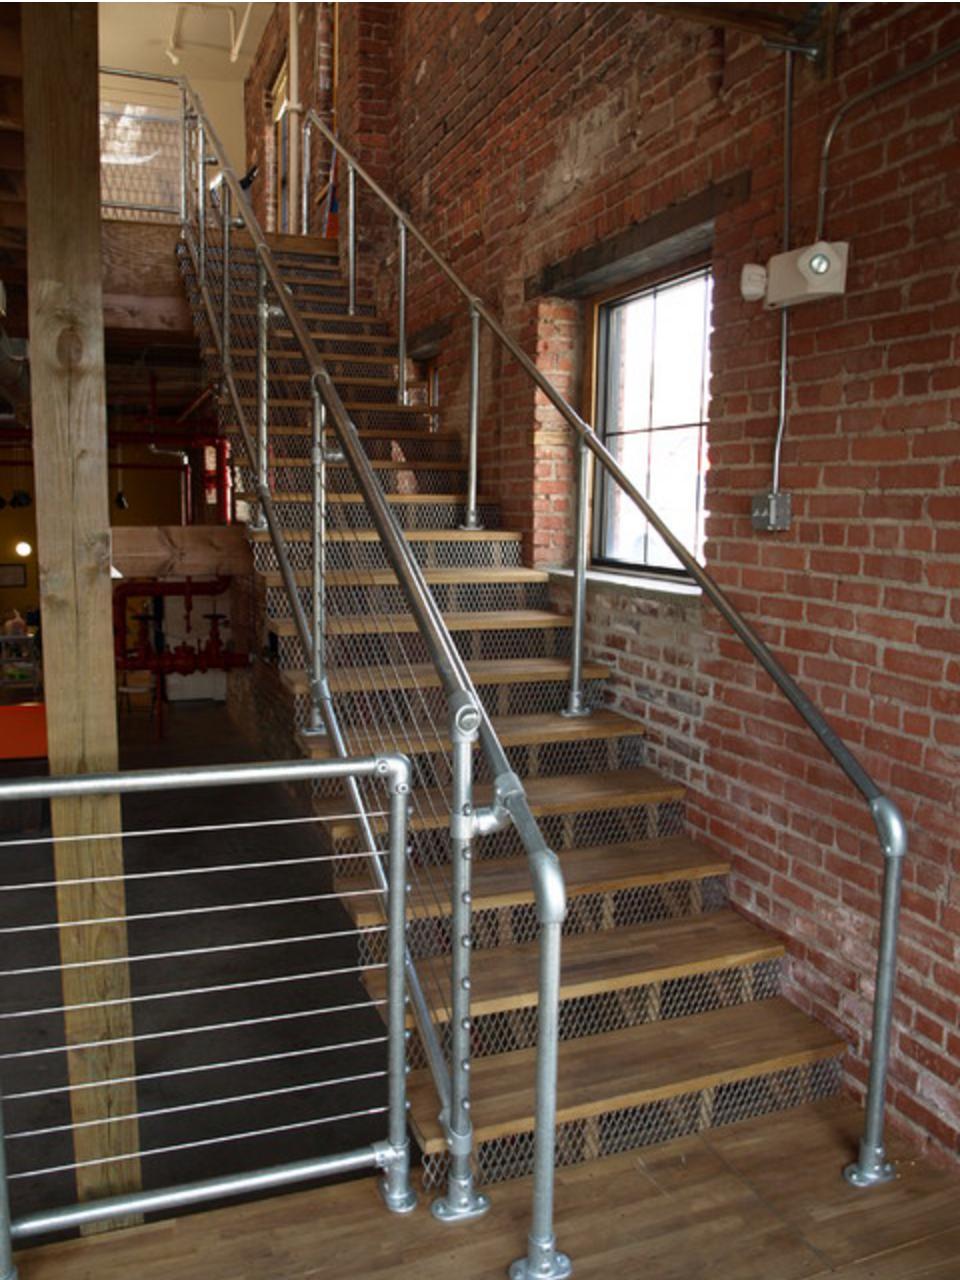 Best Industrial Pipe Galvanized Steel Handrail Kitemedia Co 400 x 300